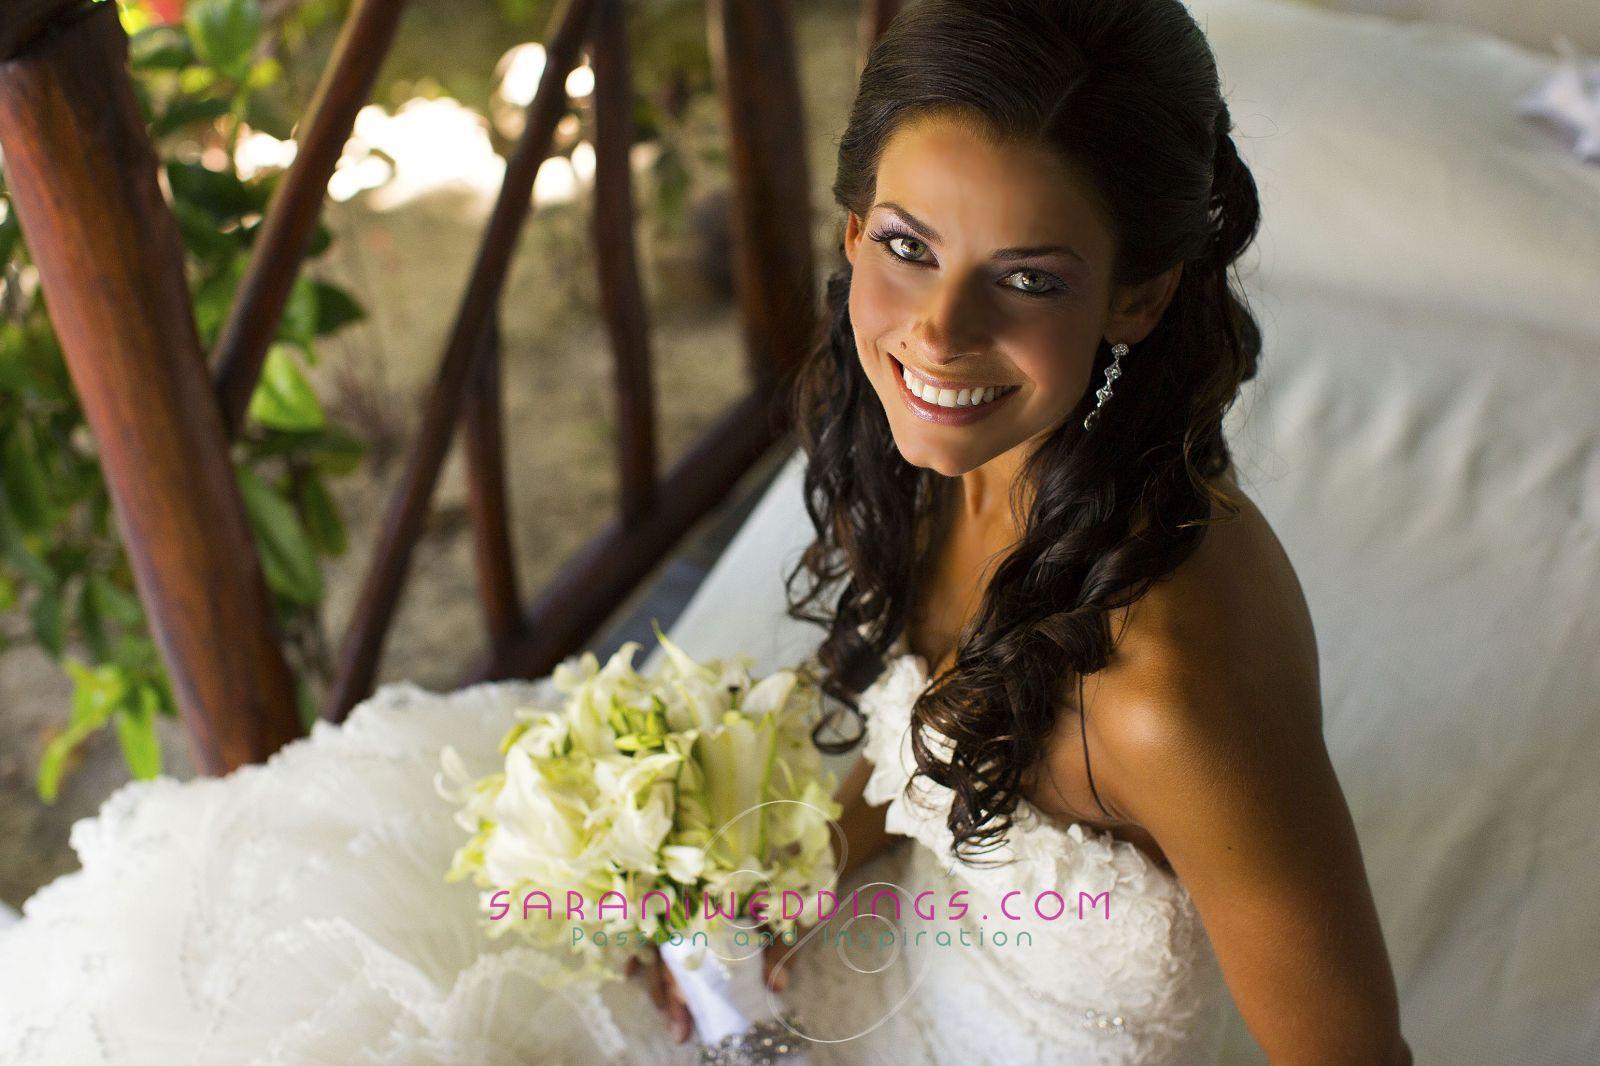 Fine Art Photography, Destination Weddings Cancun and Mayan Riviera